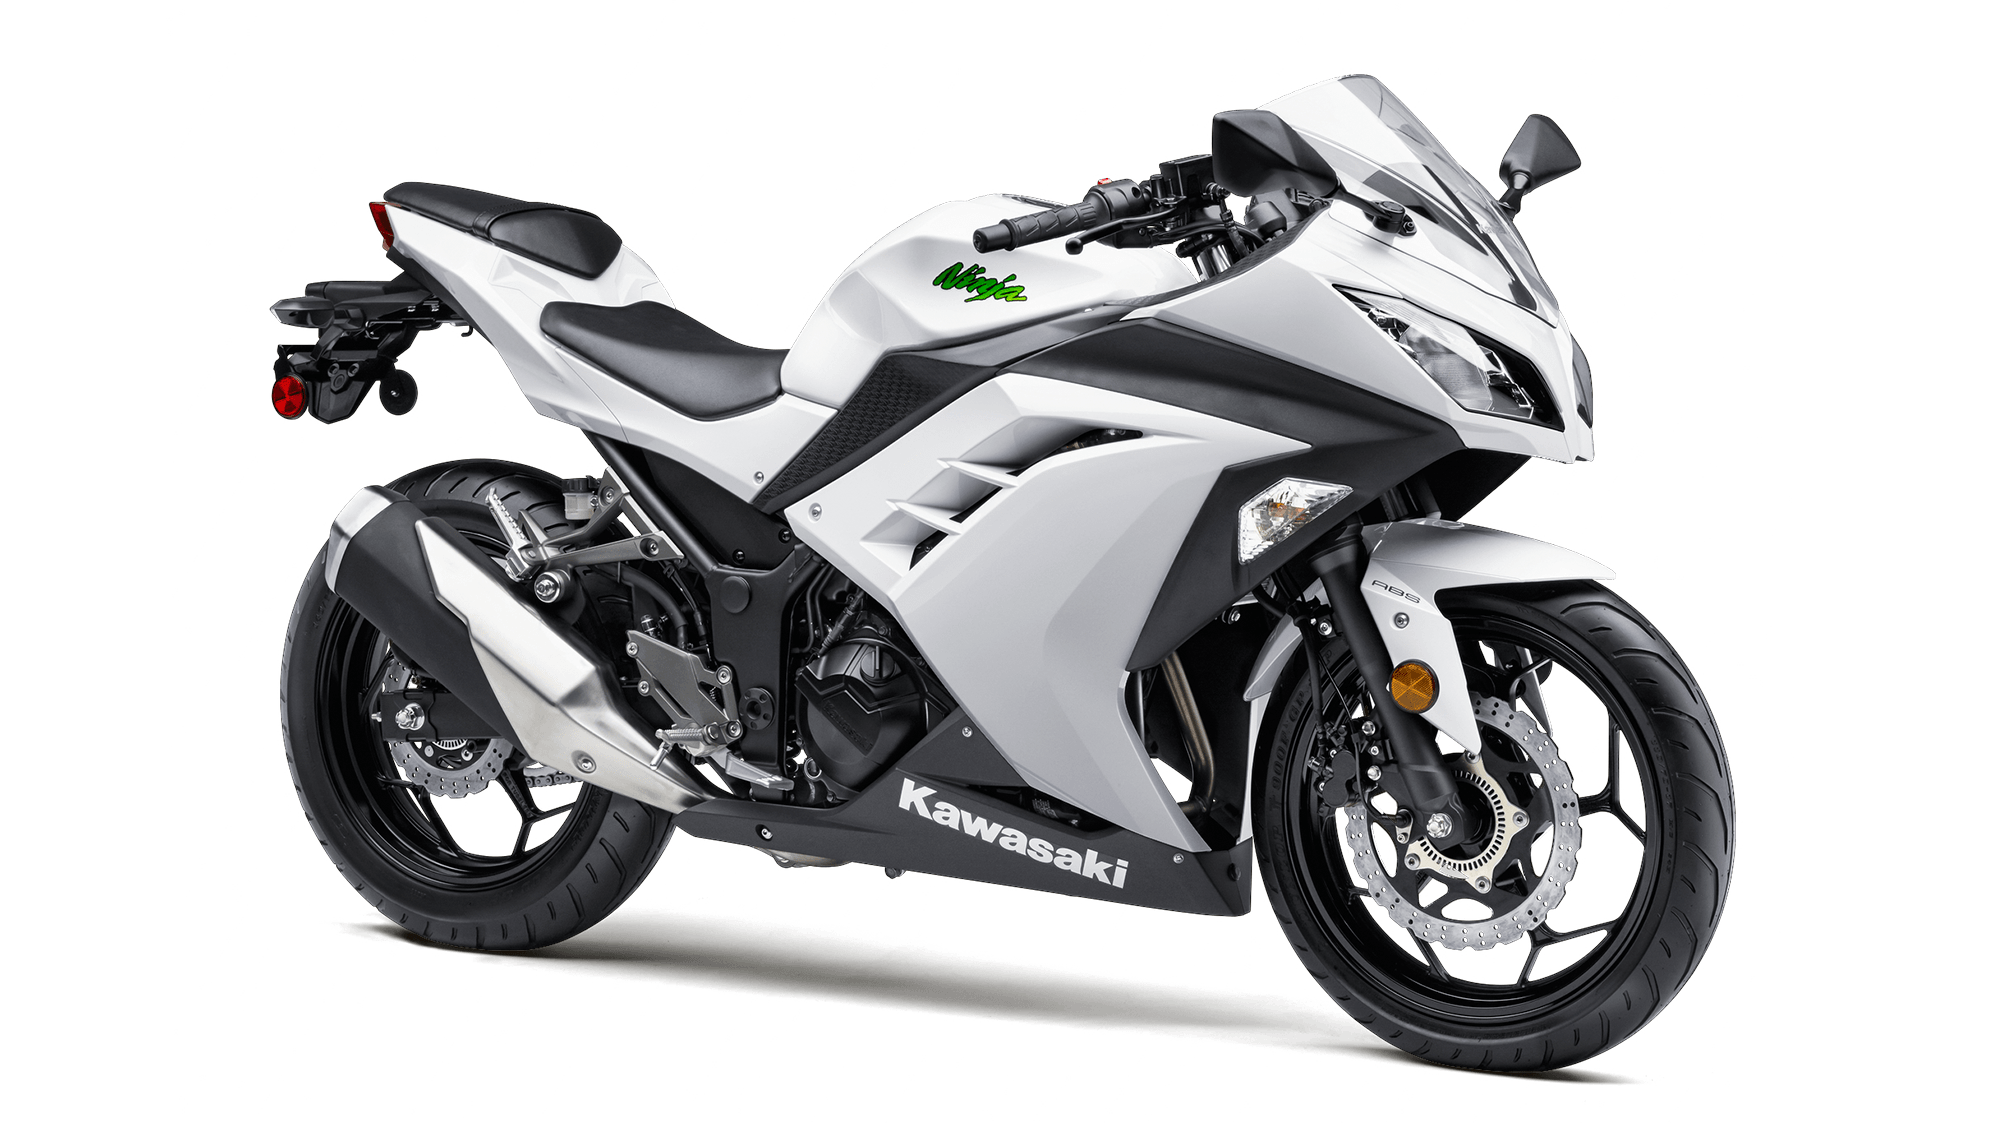 motorbike insurance thailand KAWASAKI Ninja 250SL ABS